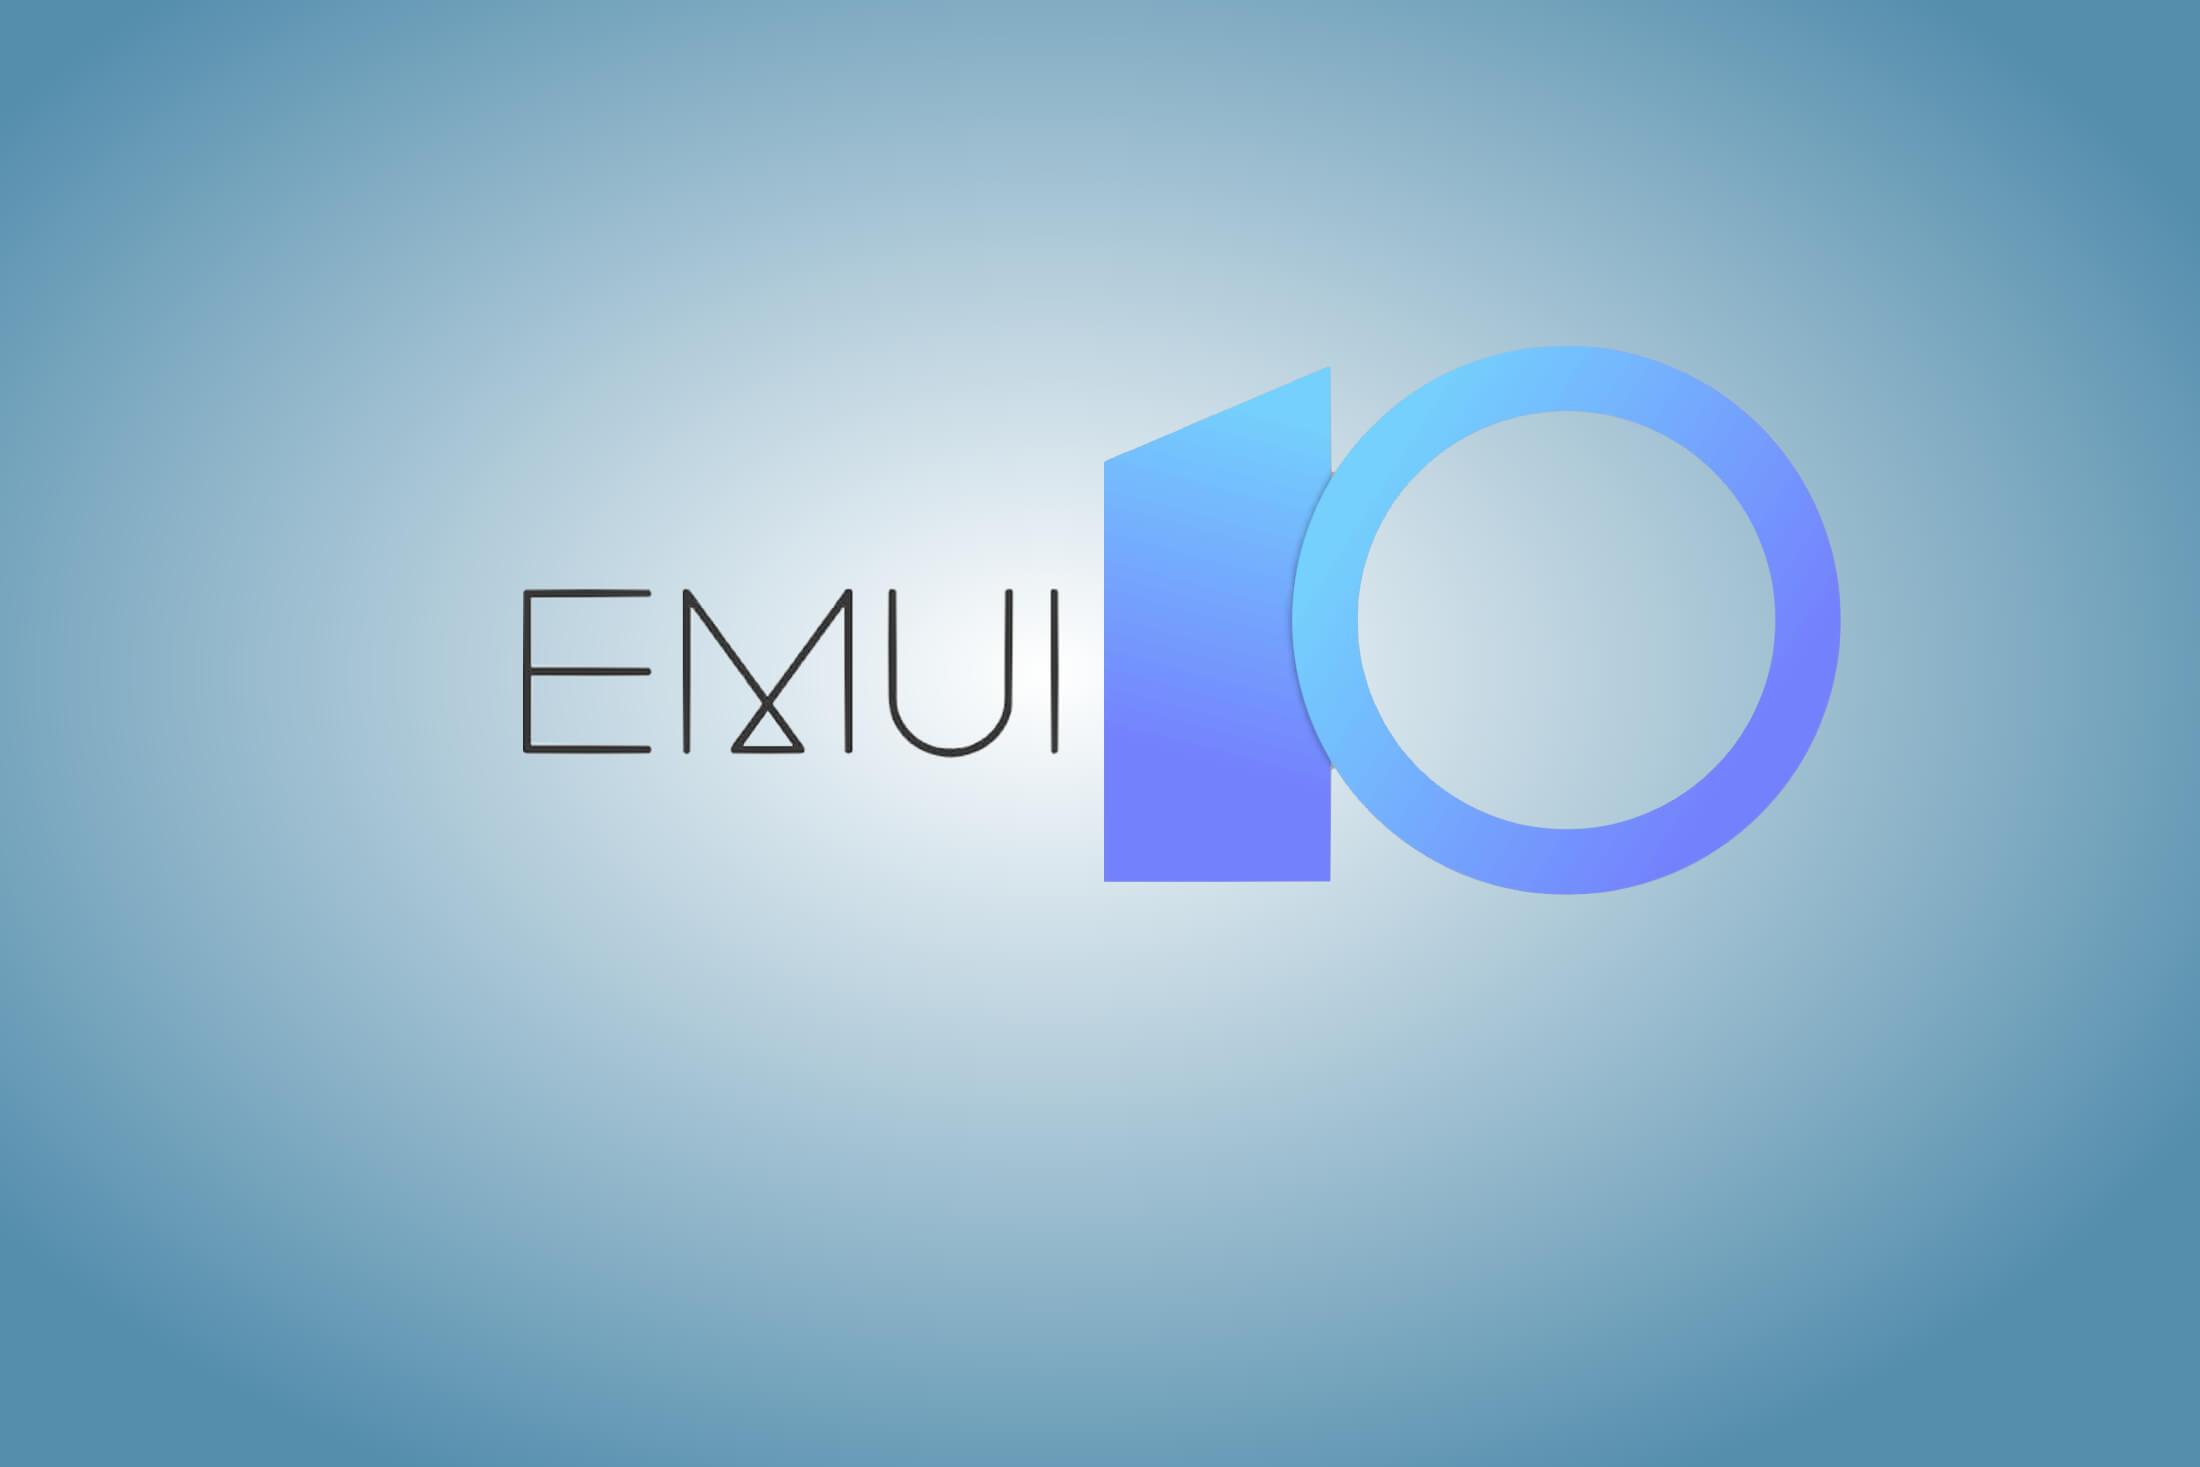 крутые фишки и настройки emui 10